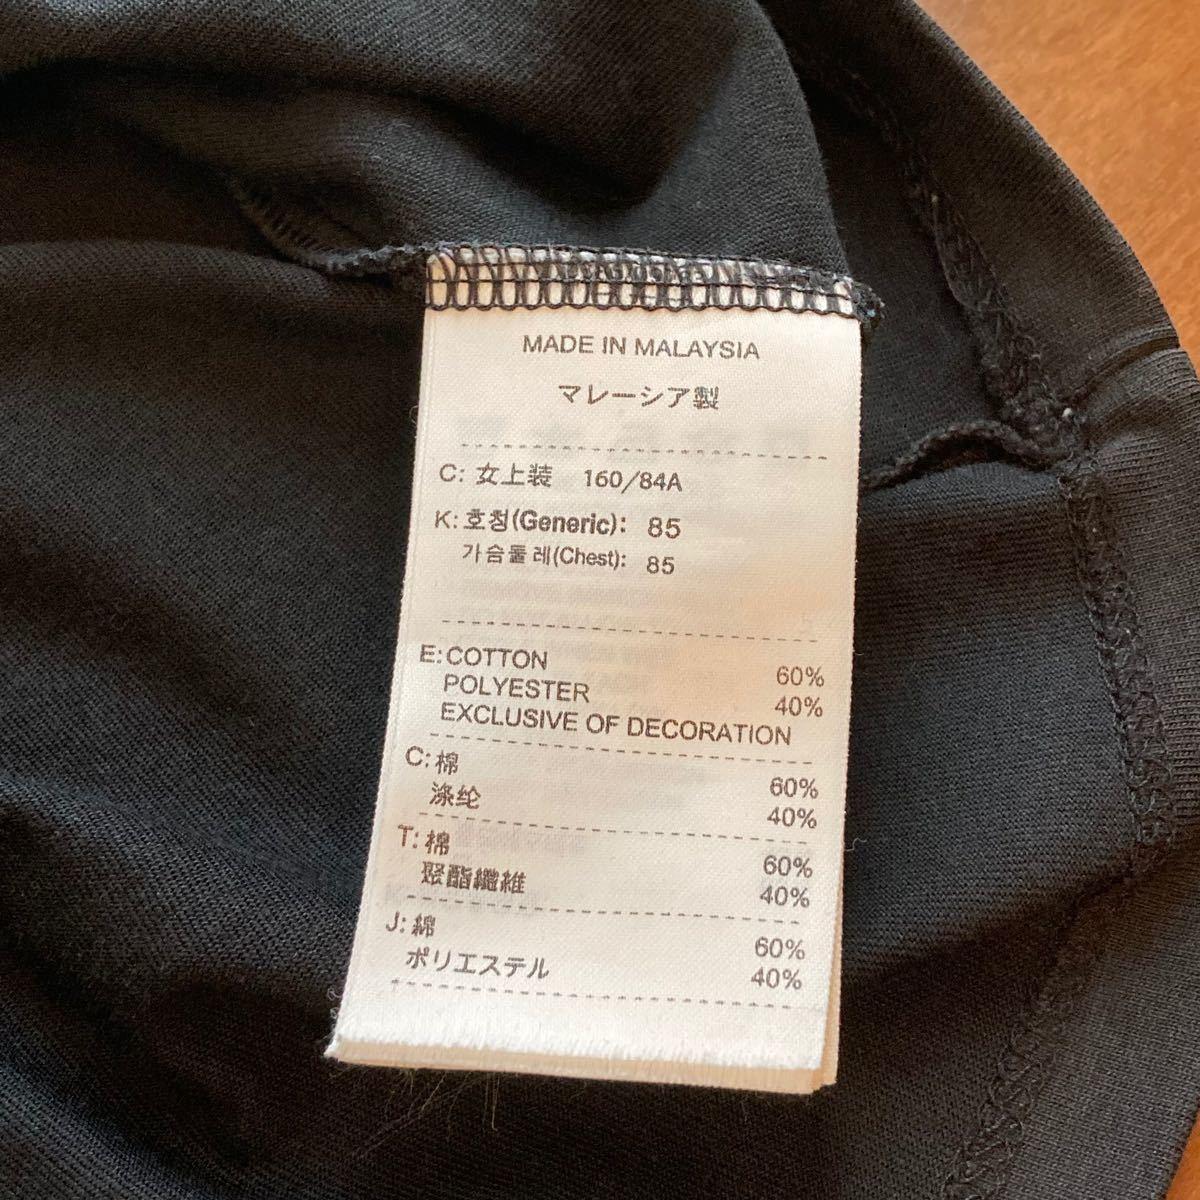 NIKE ナイキ 半袖Tシャツ ドライフィット Mサイズ 160 黒